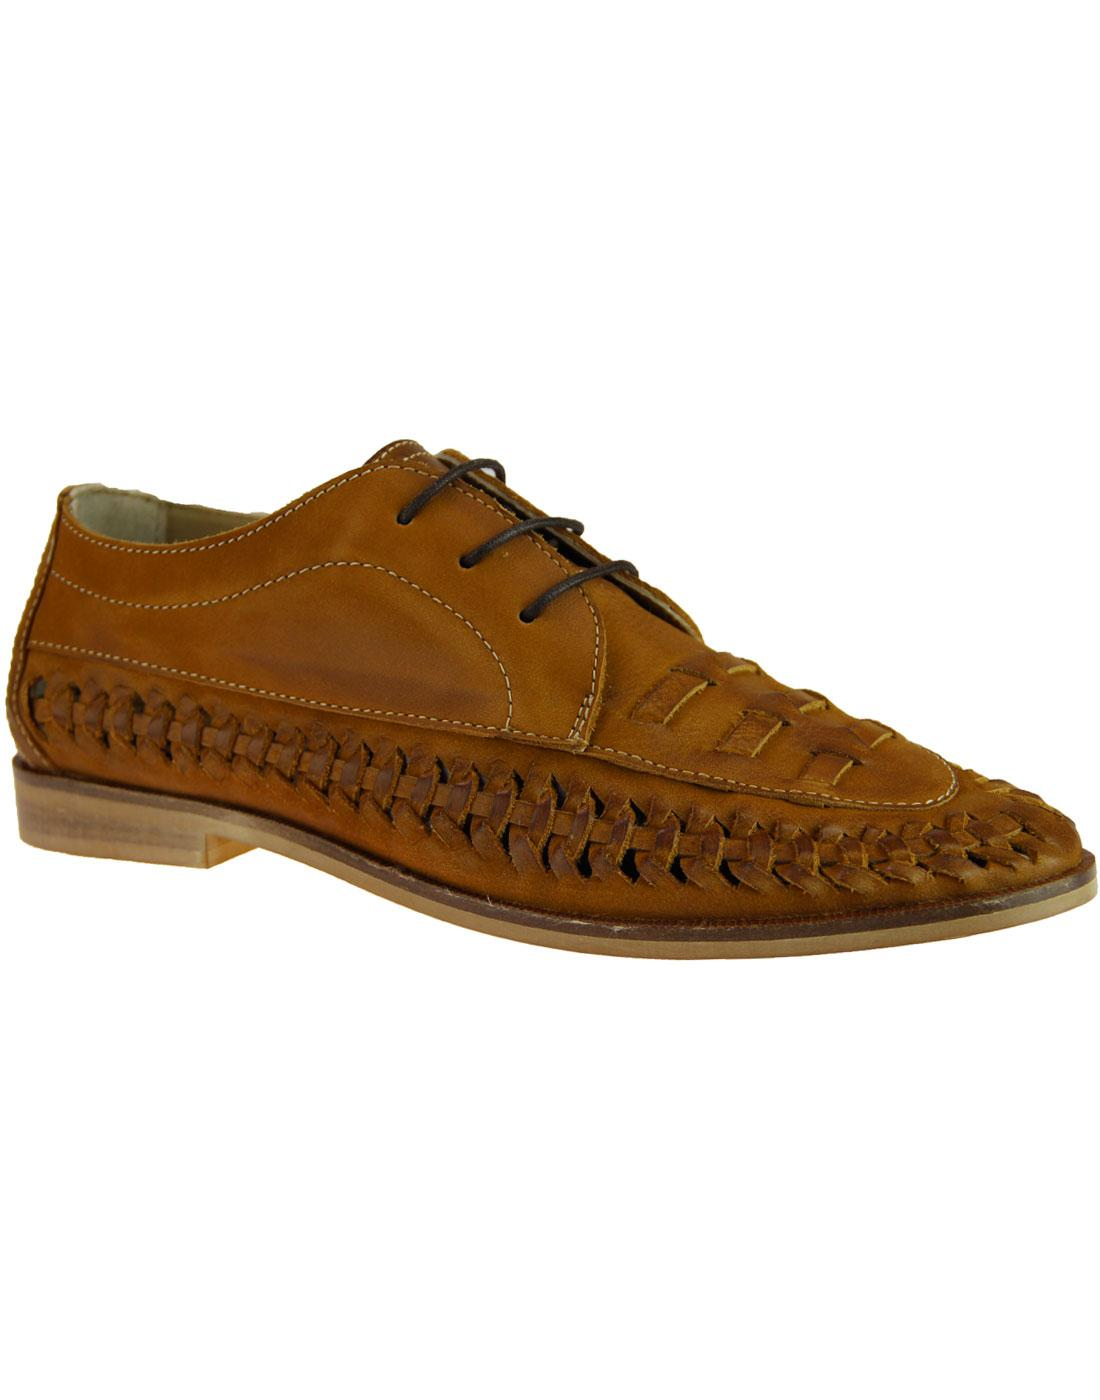 Tobin PAOLO VANDINI Retro 70s Nubuck Summer Shoes